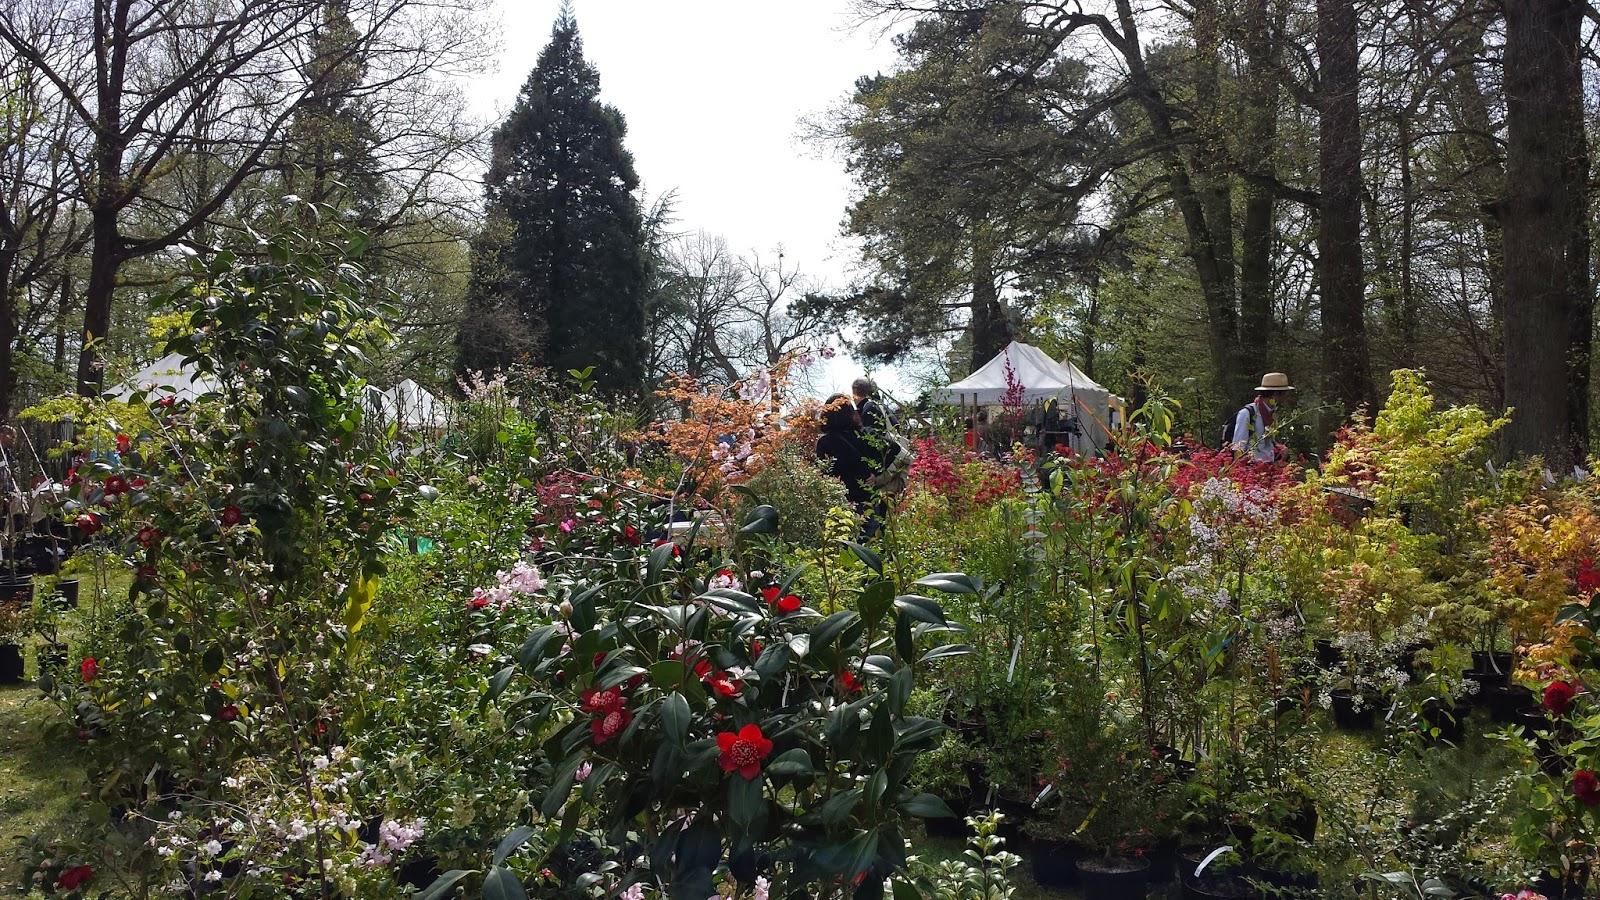 Atelier c te jardin st jean de beauregard printemps 2015 for Jardin printemps 2015